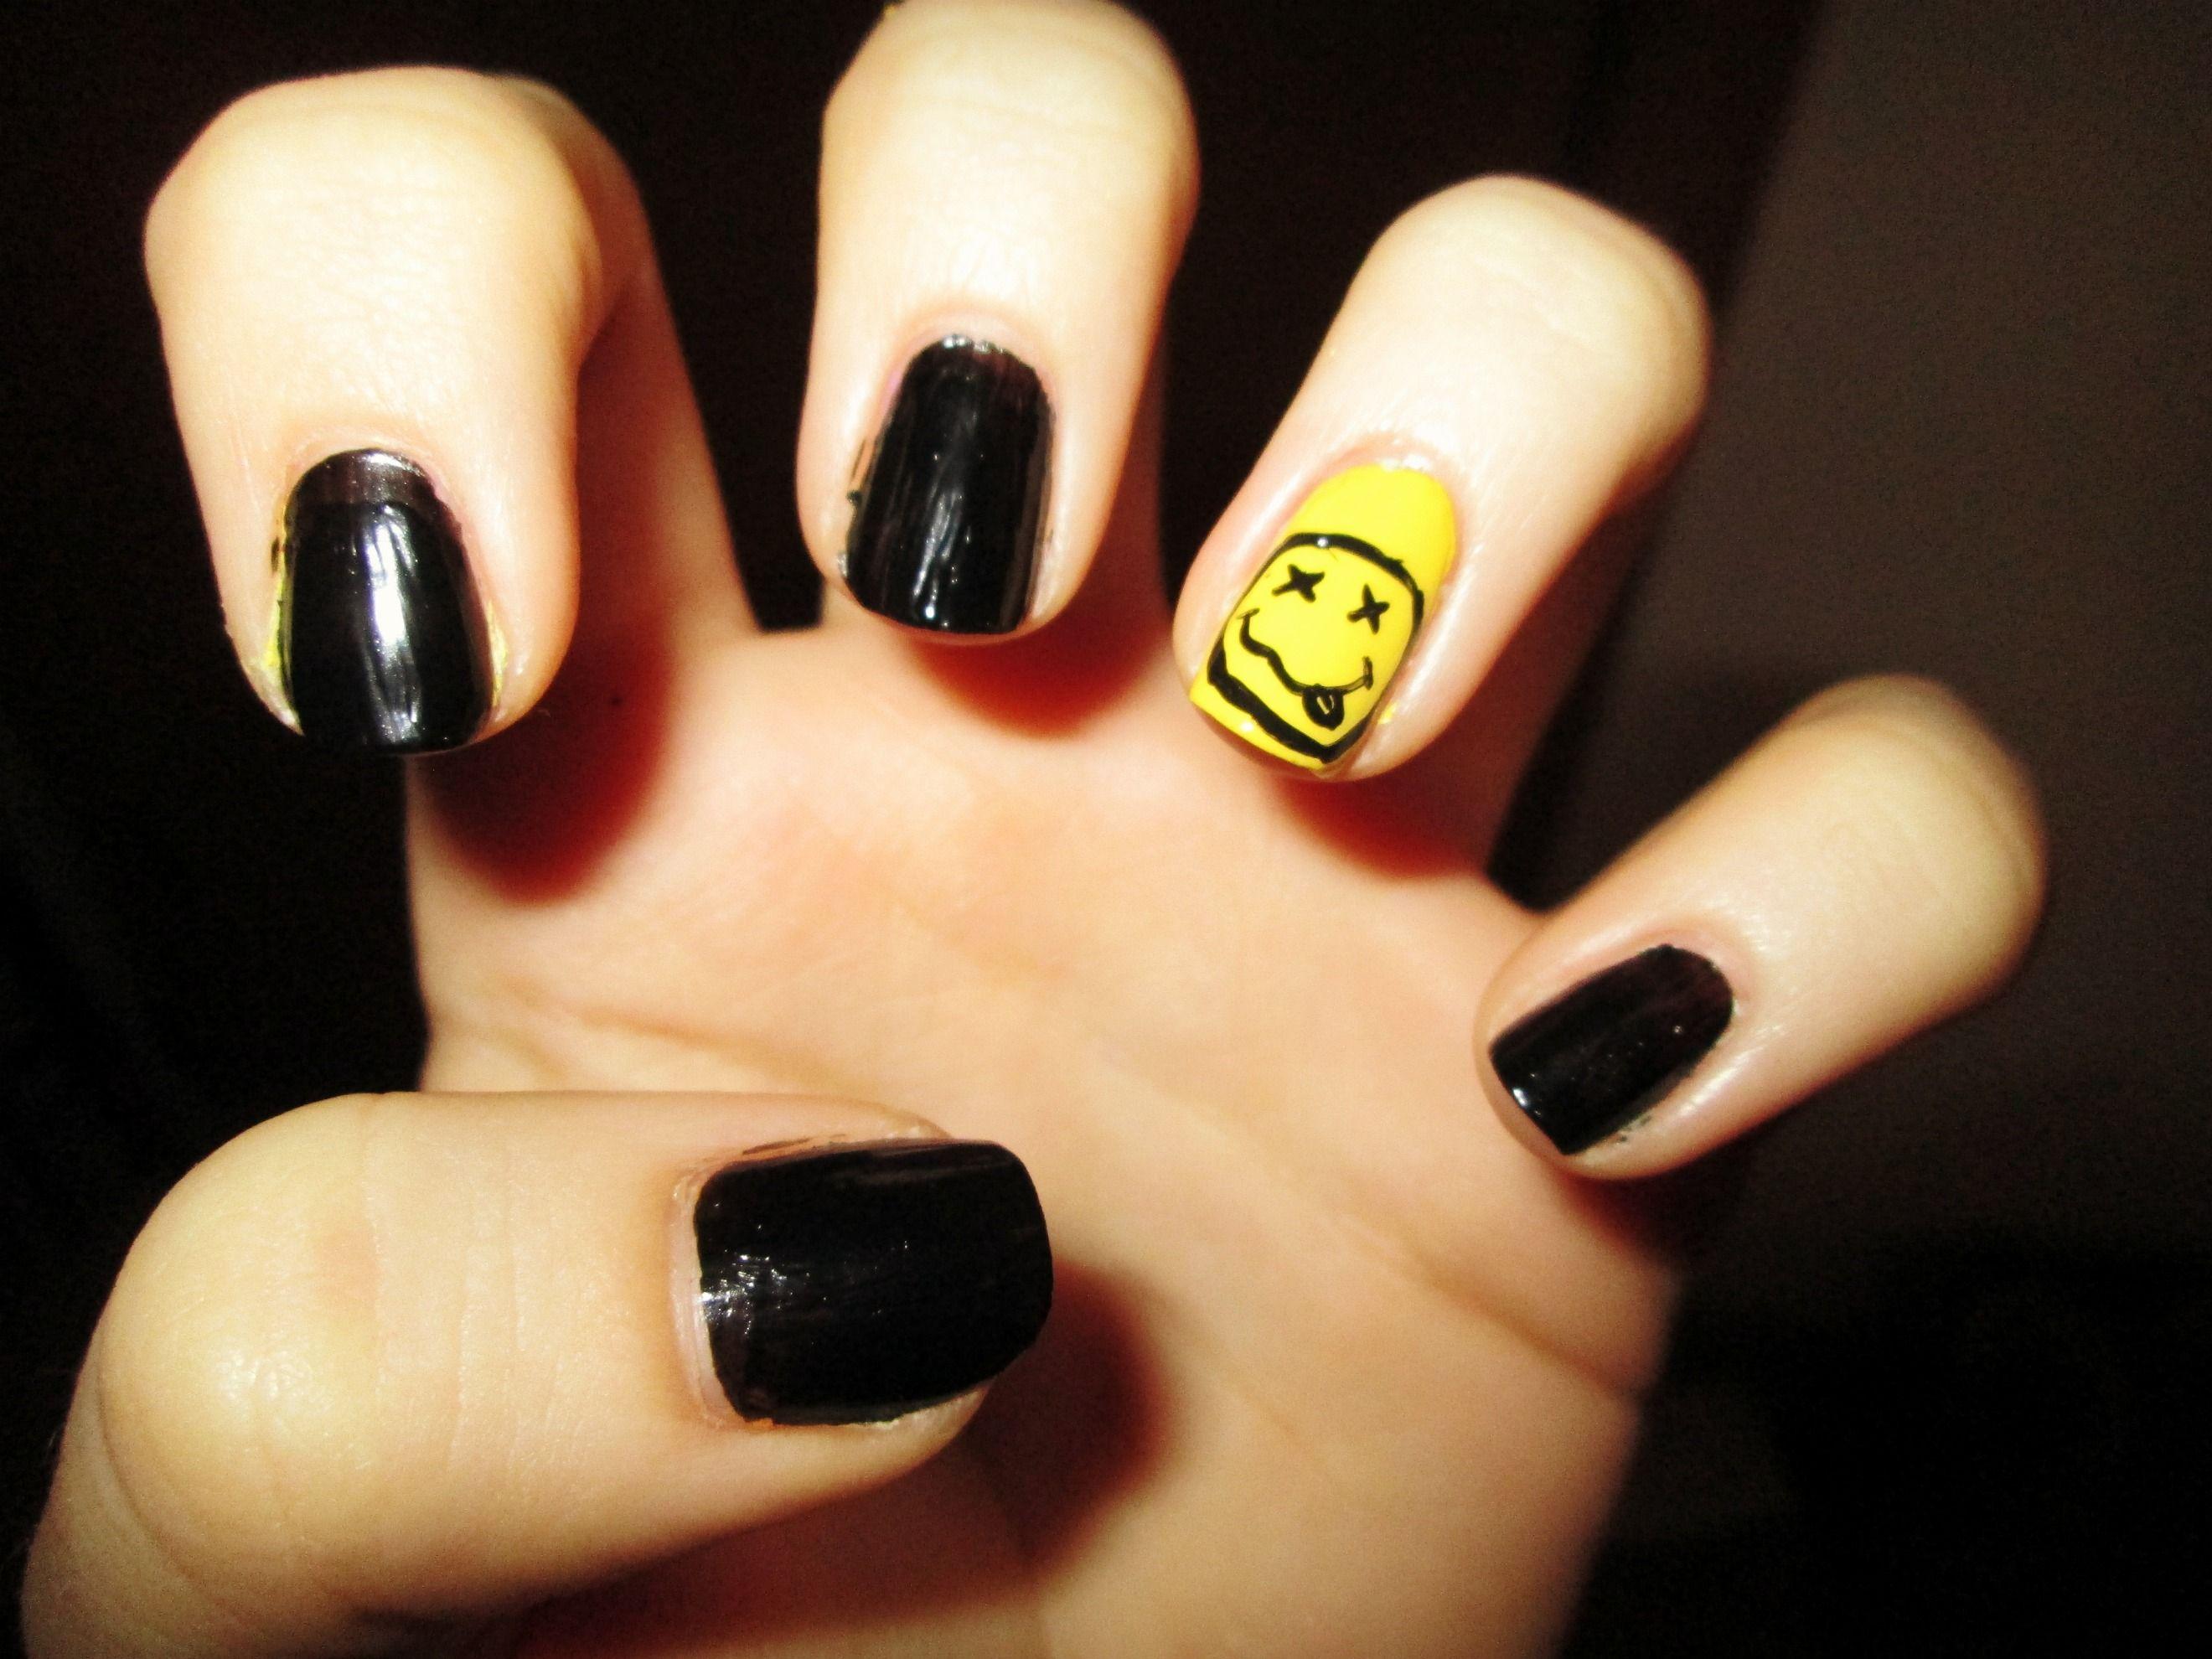 Nirvana #nails #nailart #nirvana | My own nail stuff. | Pinterest ...